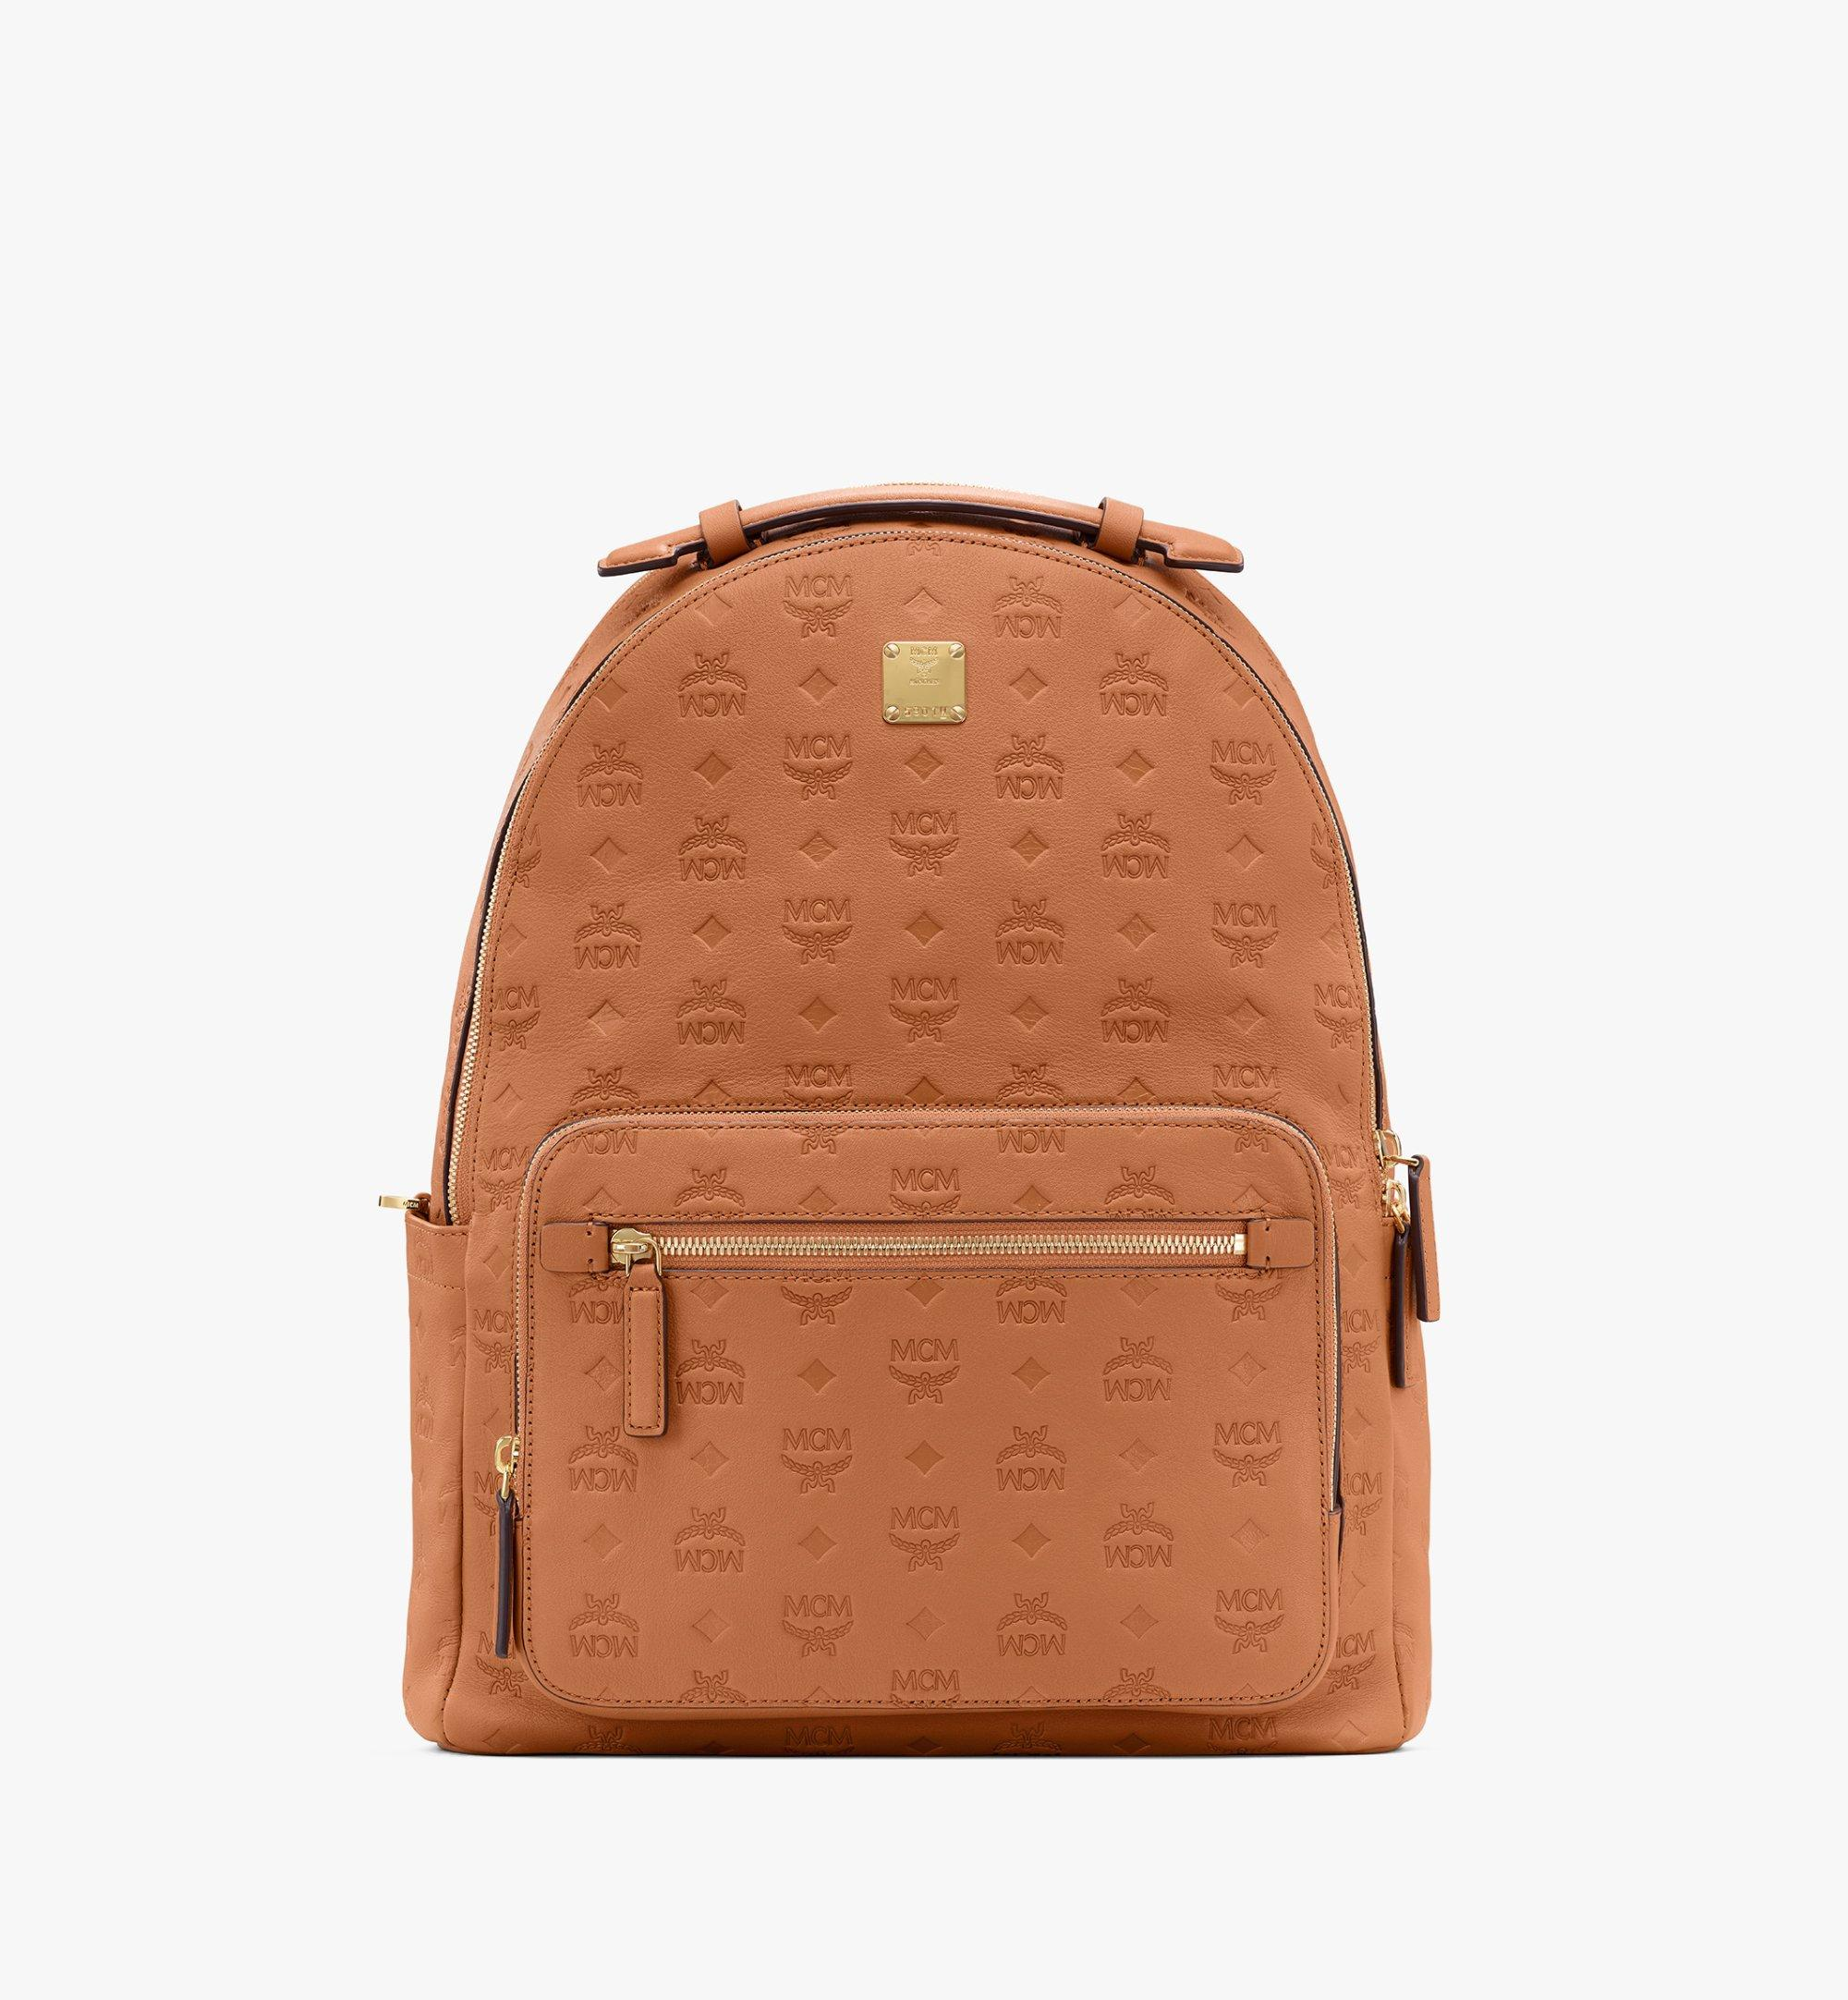 40 Cm 16 In Stark Backpack In Monogram Leather Cognac Mcm Pt